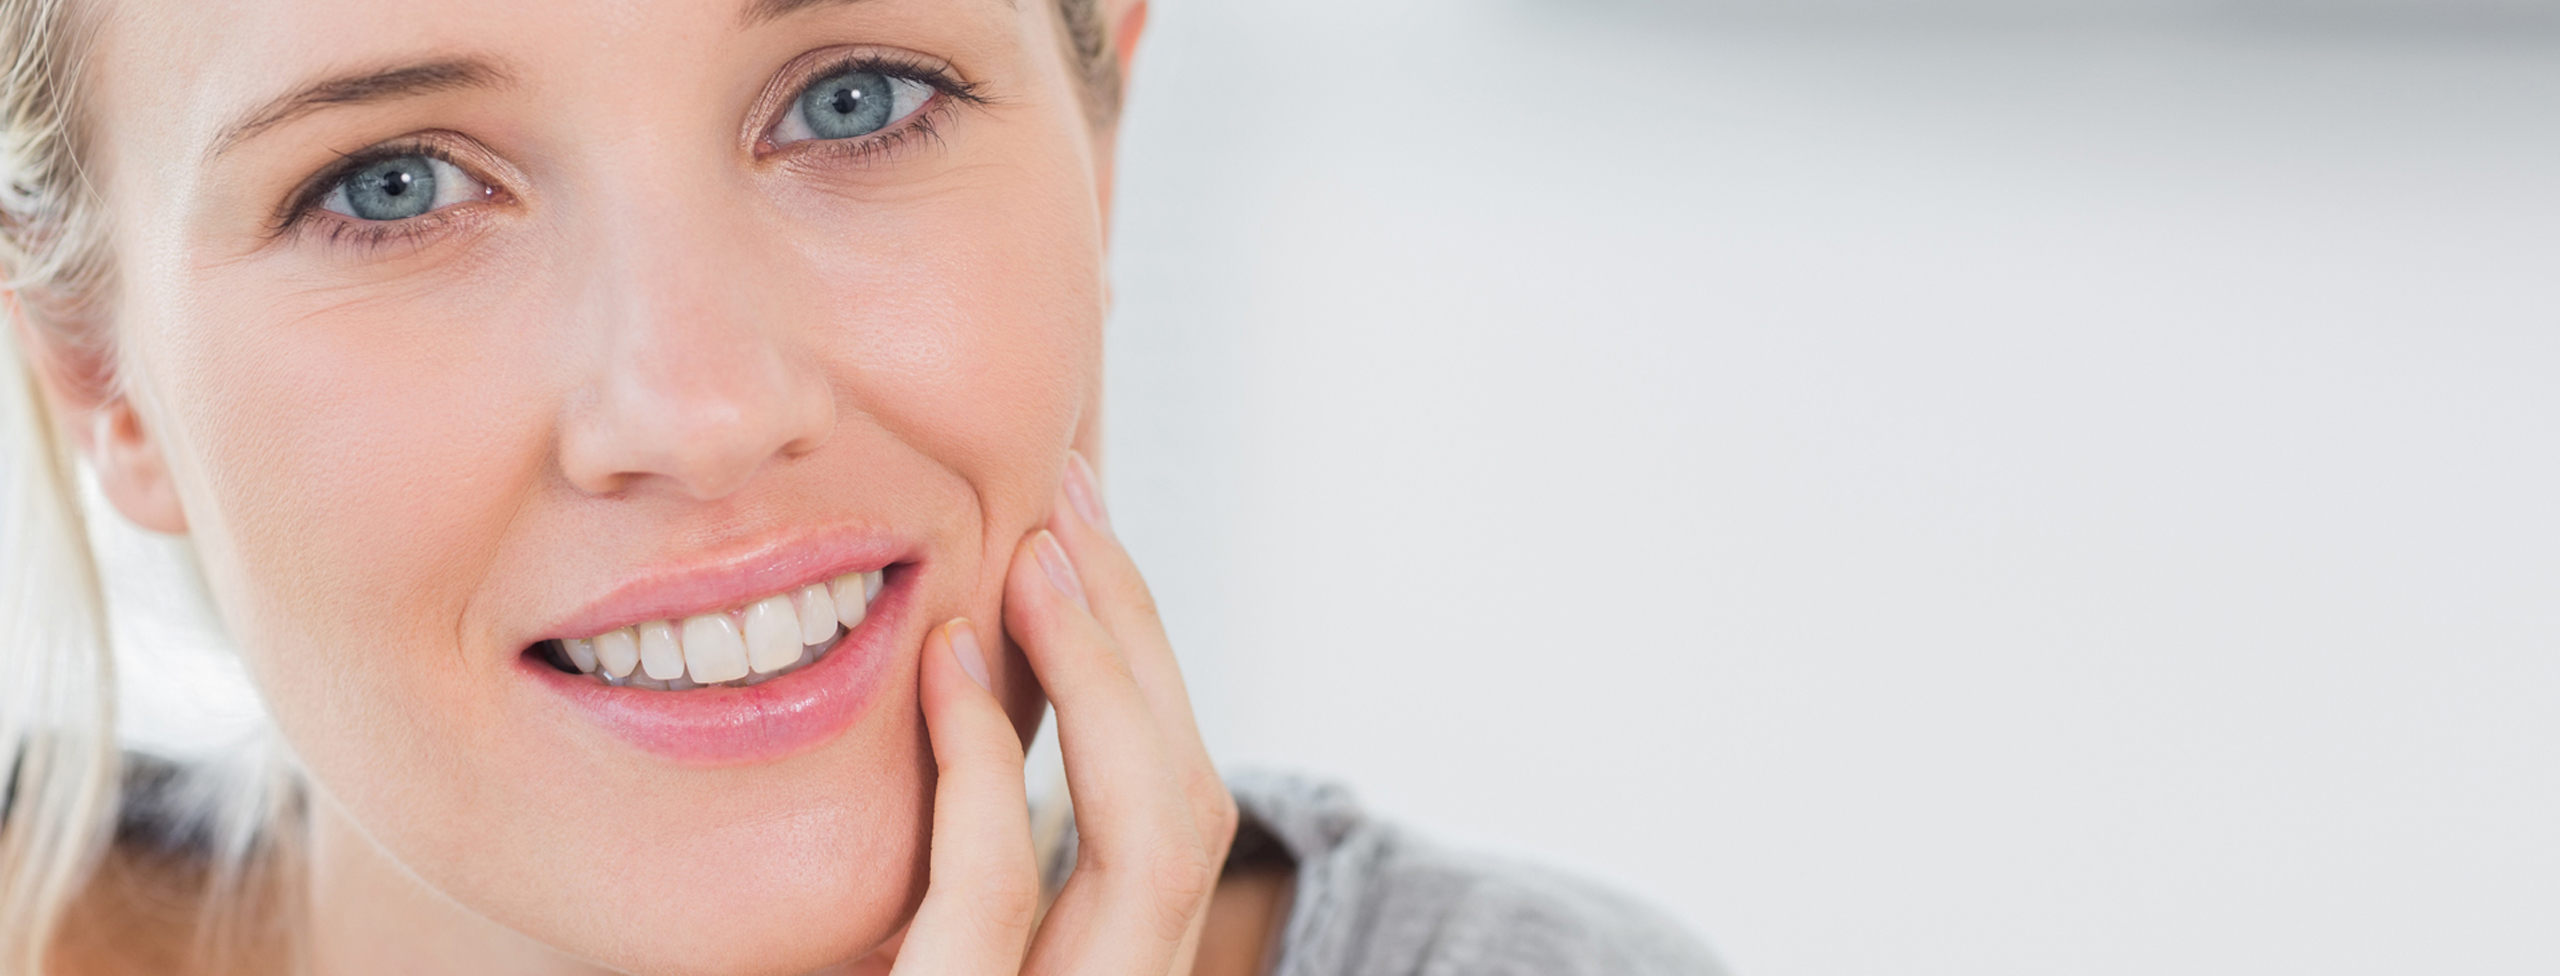 Bienvenido a la clínica dental Mediterránea